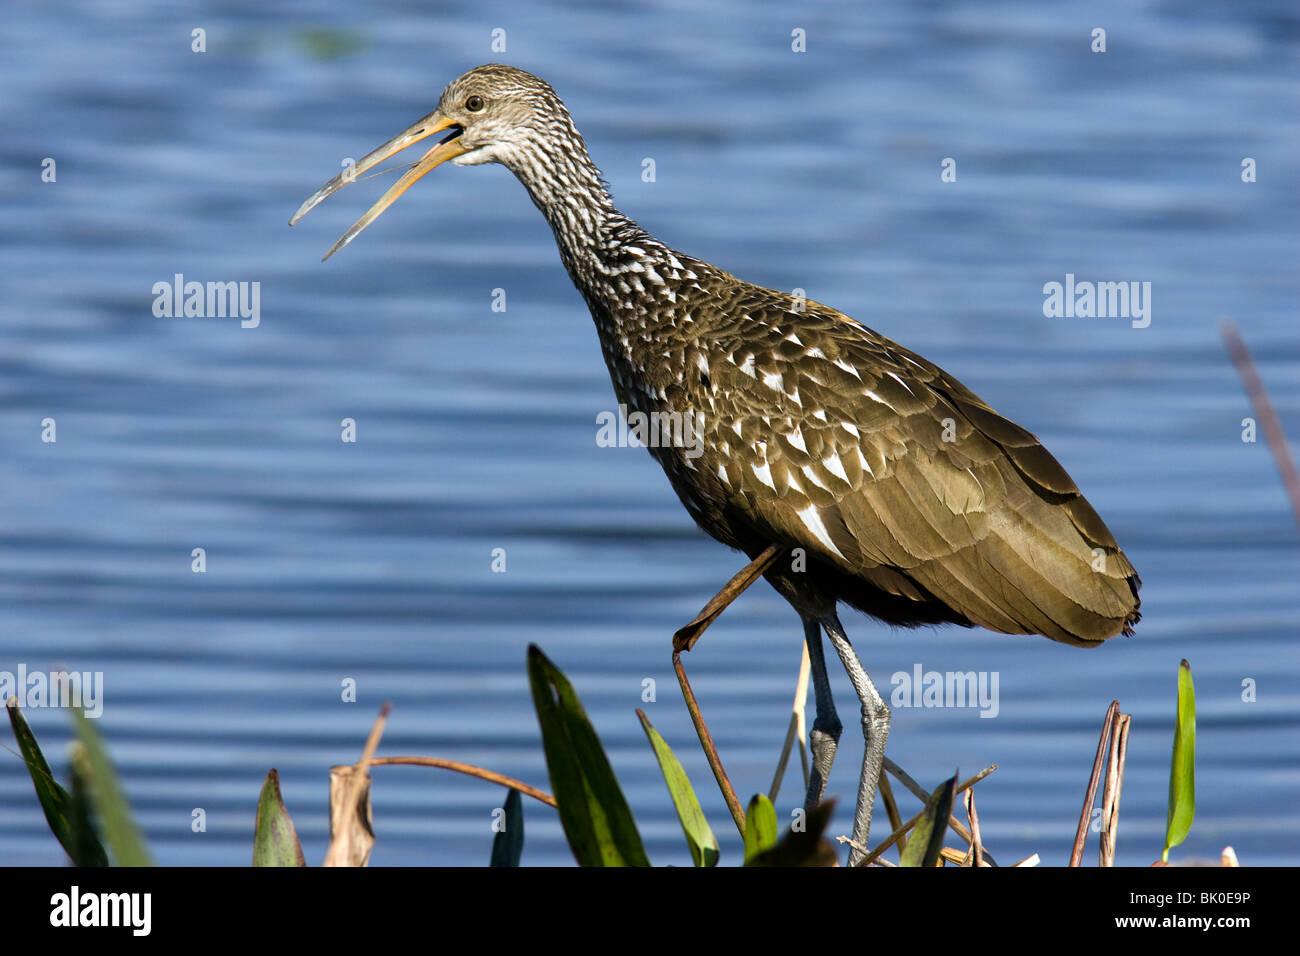 Limpkin - Green Cay Humedales - Delray Beach, Florida, EE.UU. Imagen De Stock